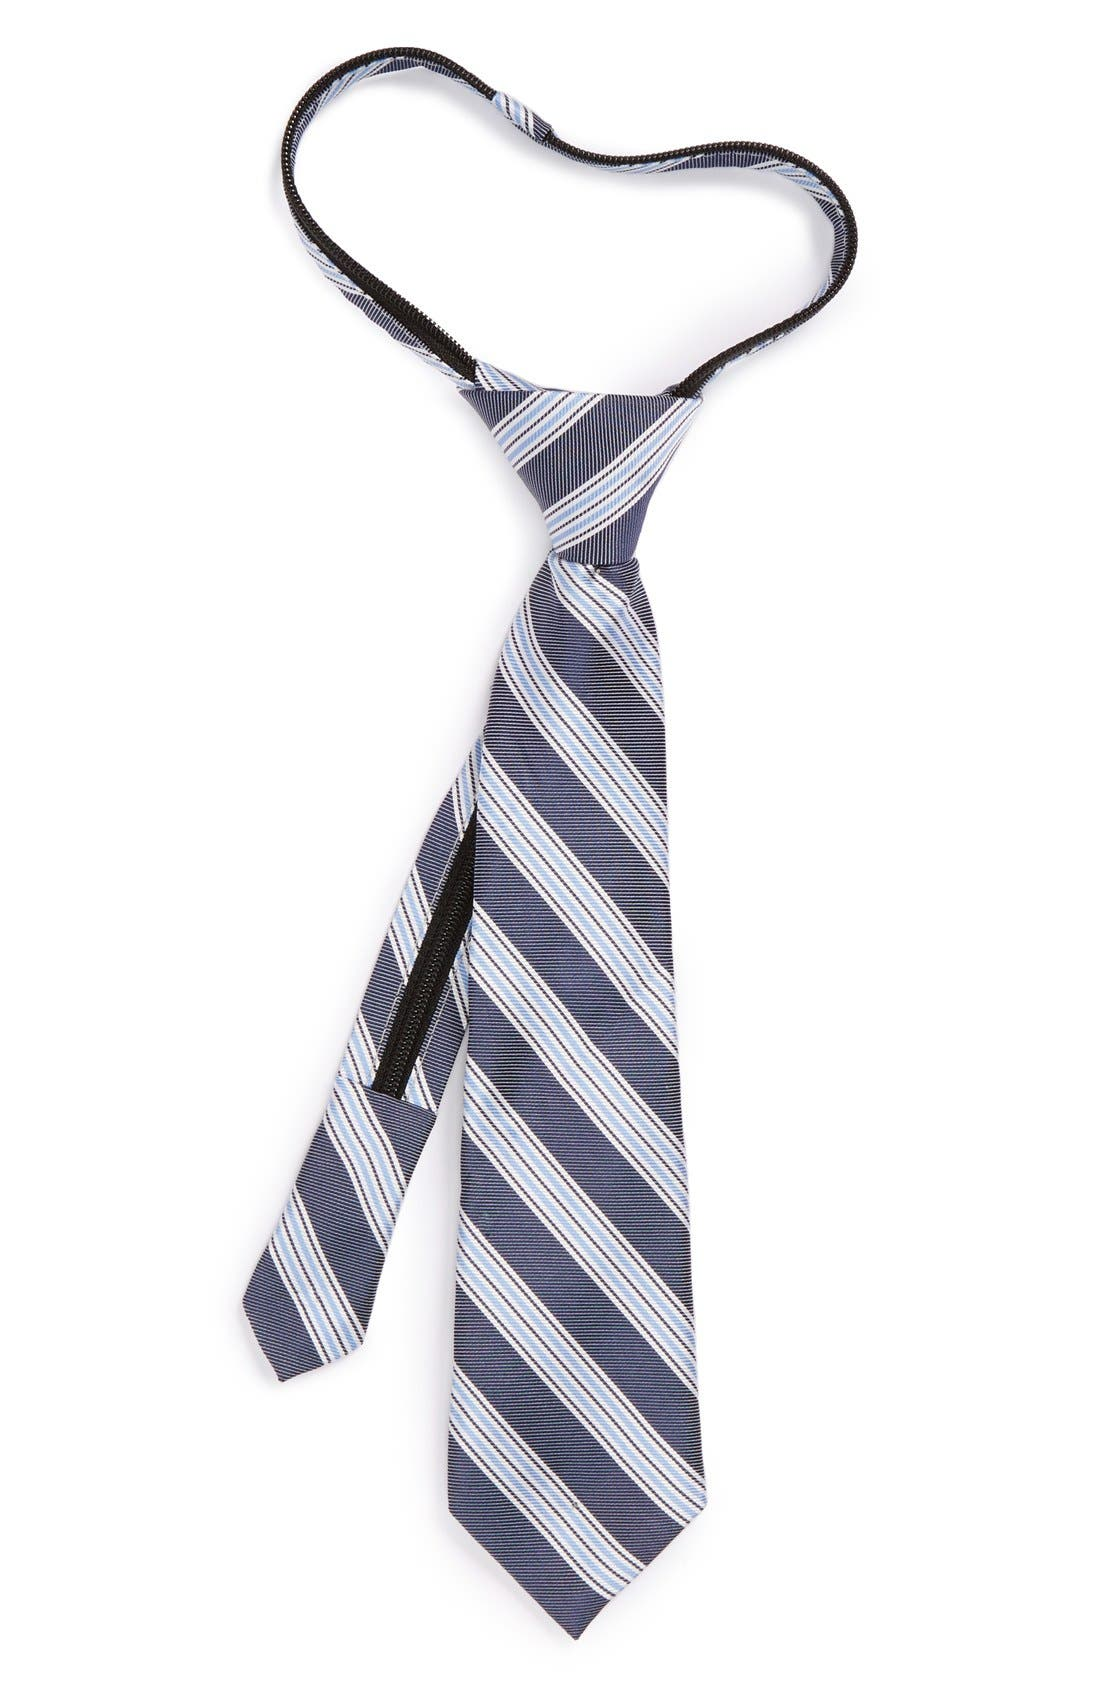 Alternate Image 1 Selected - Nordstrom Racing Stripe Zip Tie (Little Boys)